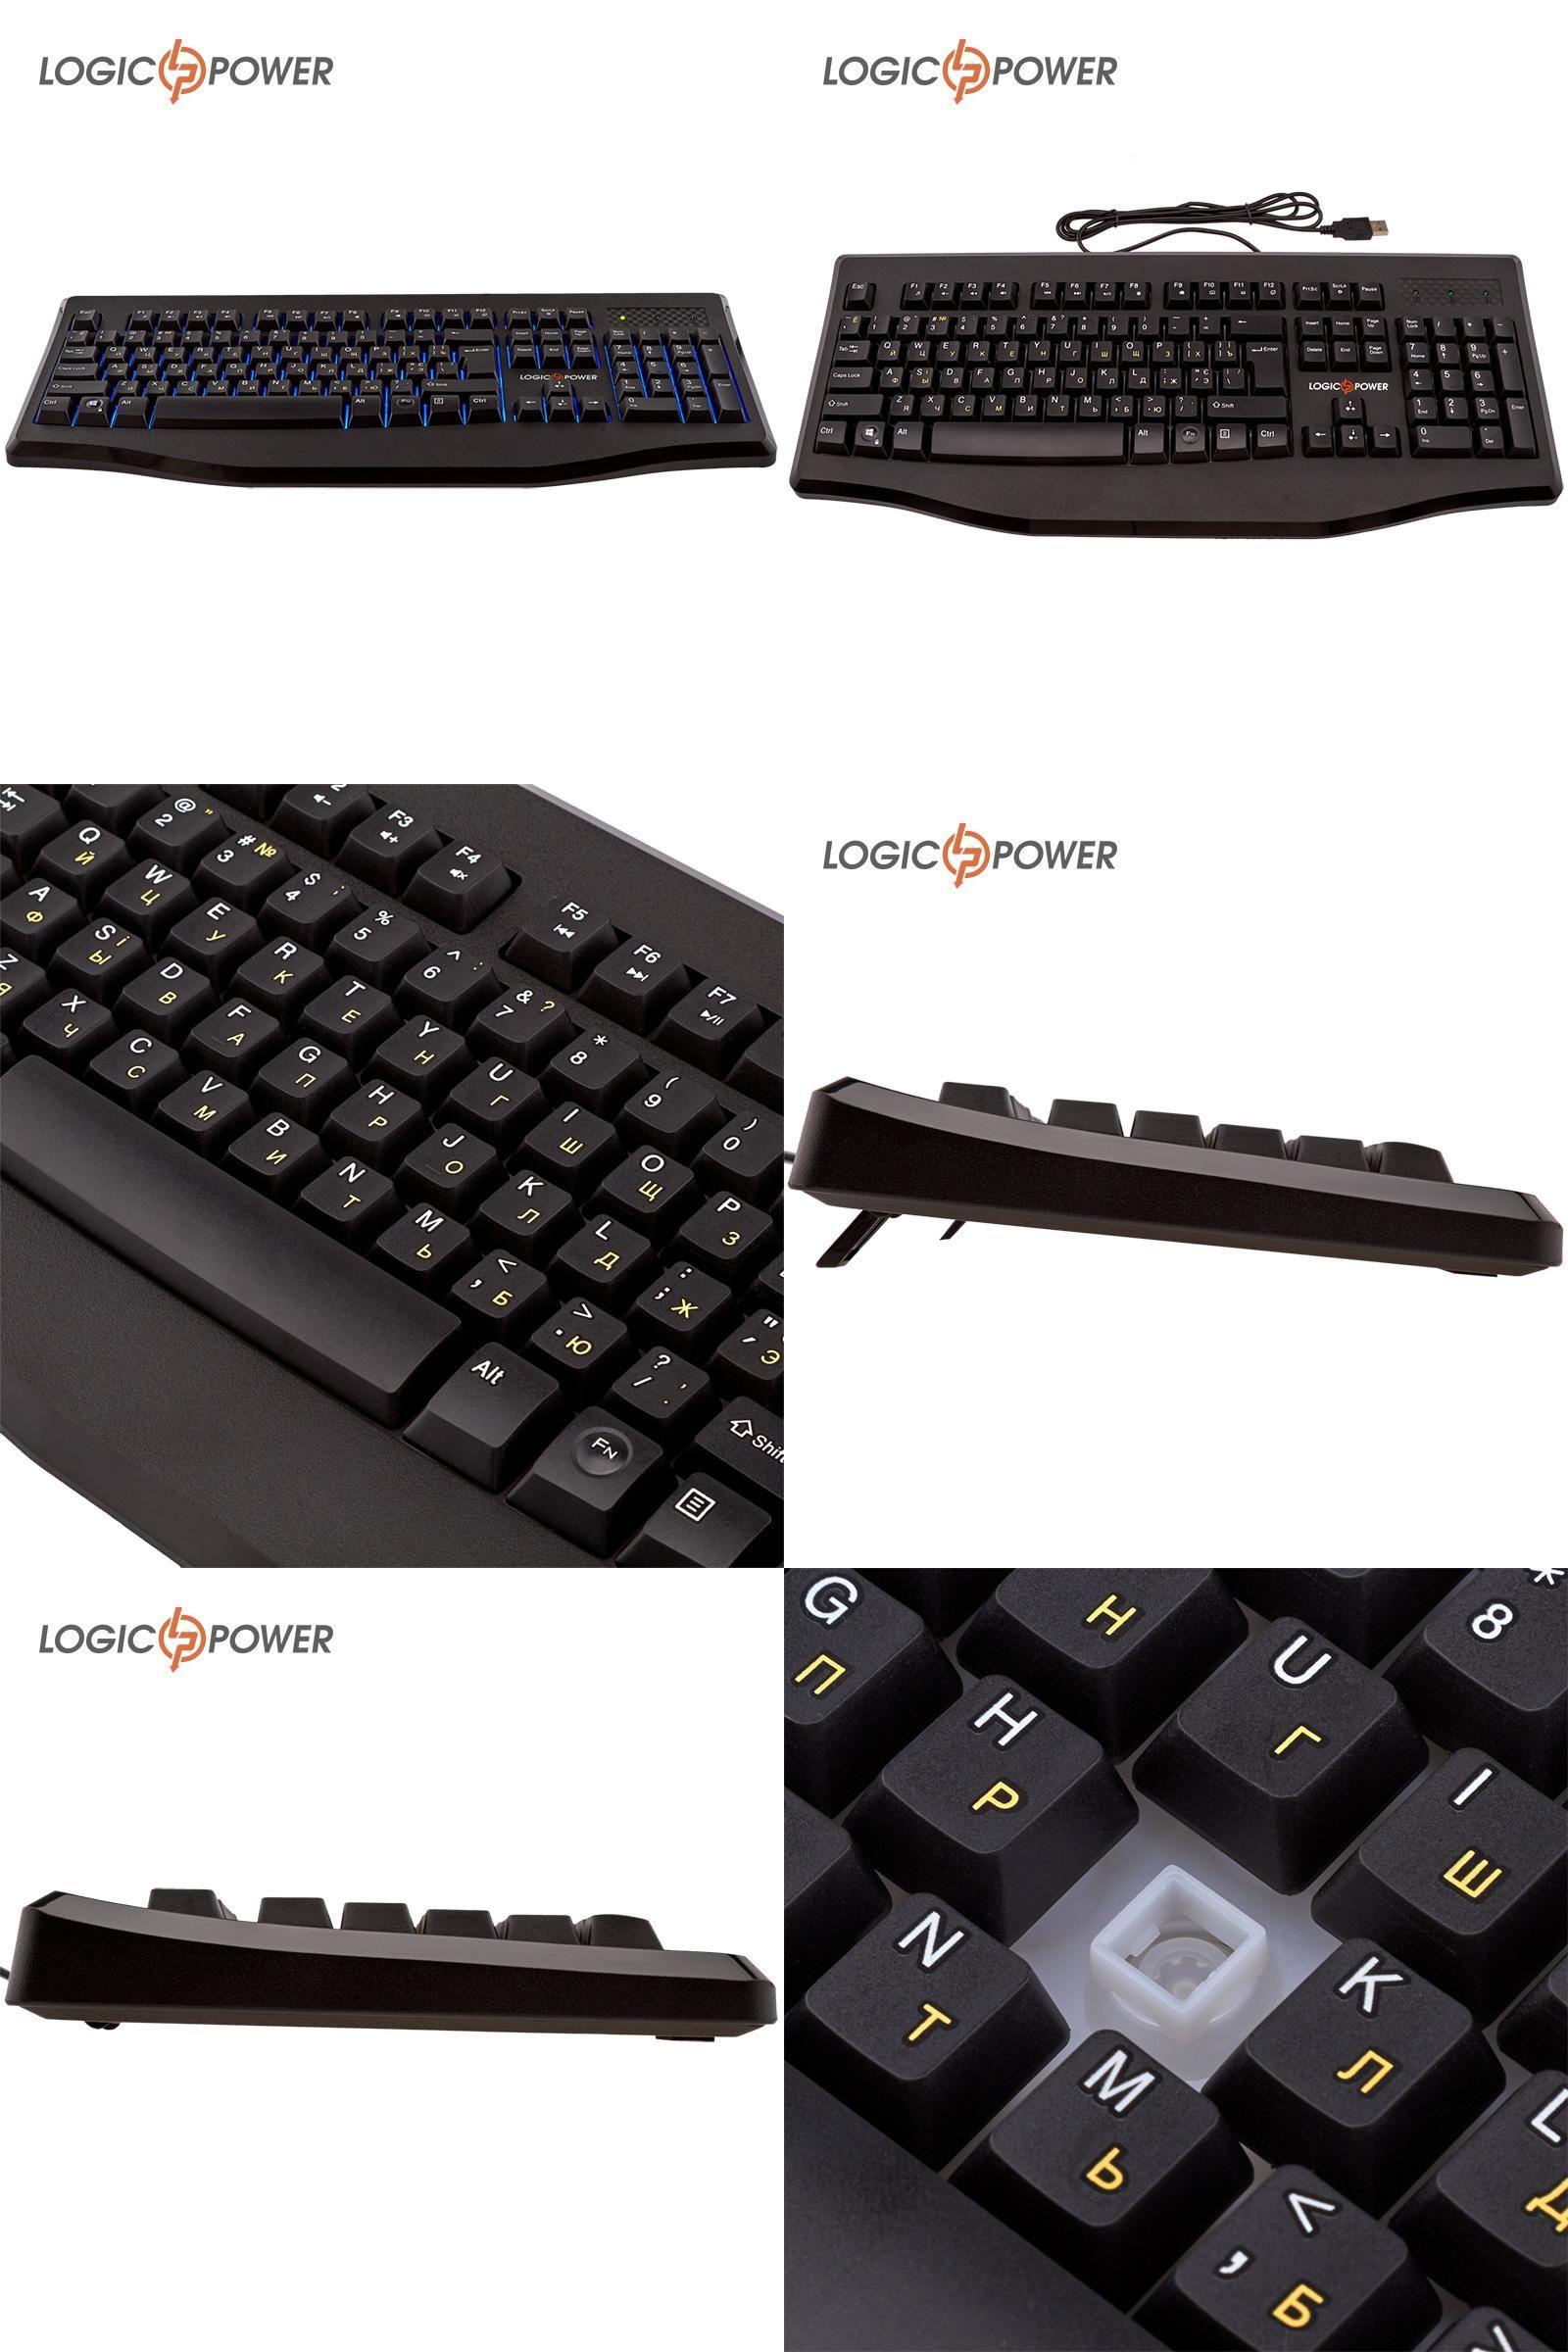 5b0be80f175 [Visit to Buy] LOGIC POWER Original Backlight Keyboard English Russian  wired USB Gaming Keyboard #4915 #Advertisement